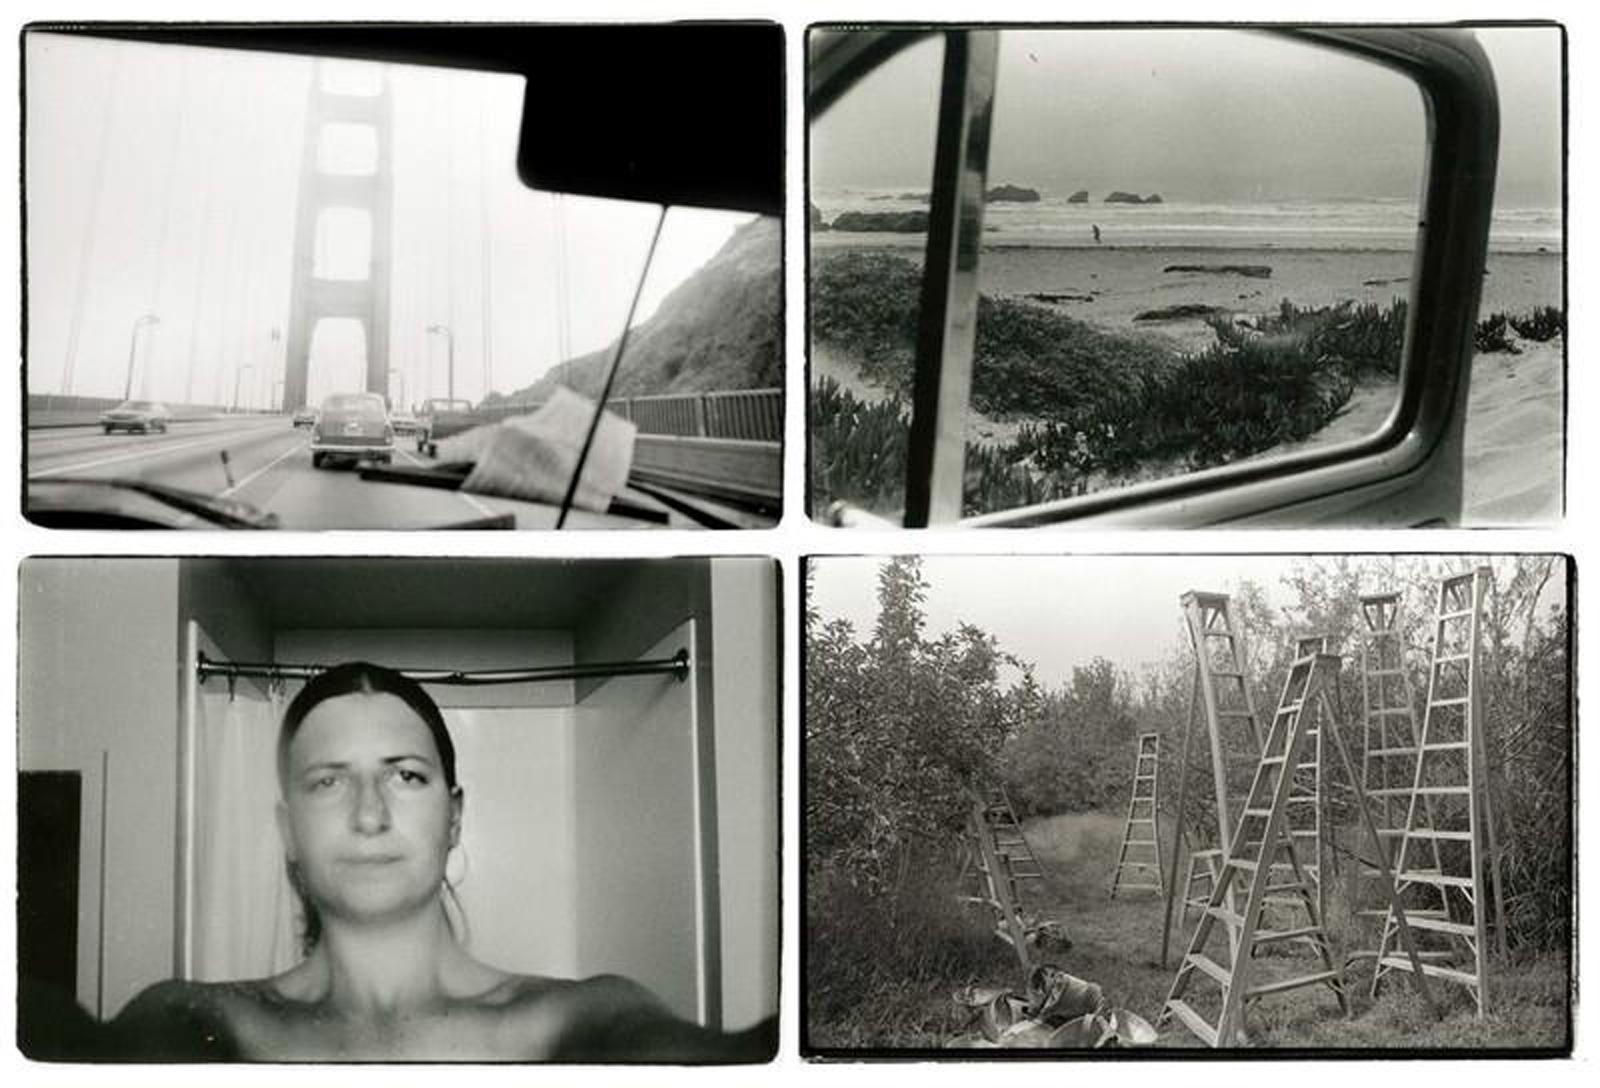 Annie Leibovitz: The Early Years, 1970-1983, art exhibit @ Hauser & Wirth // photo source: facebook